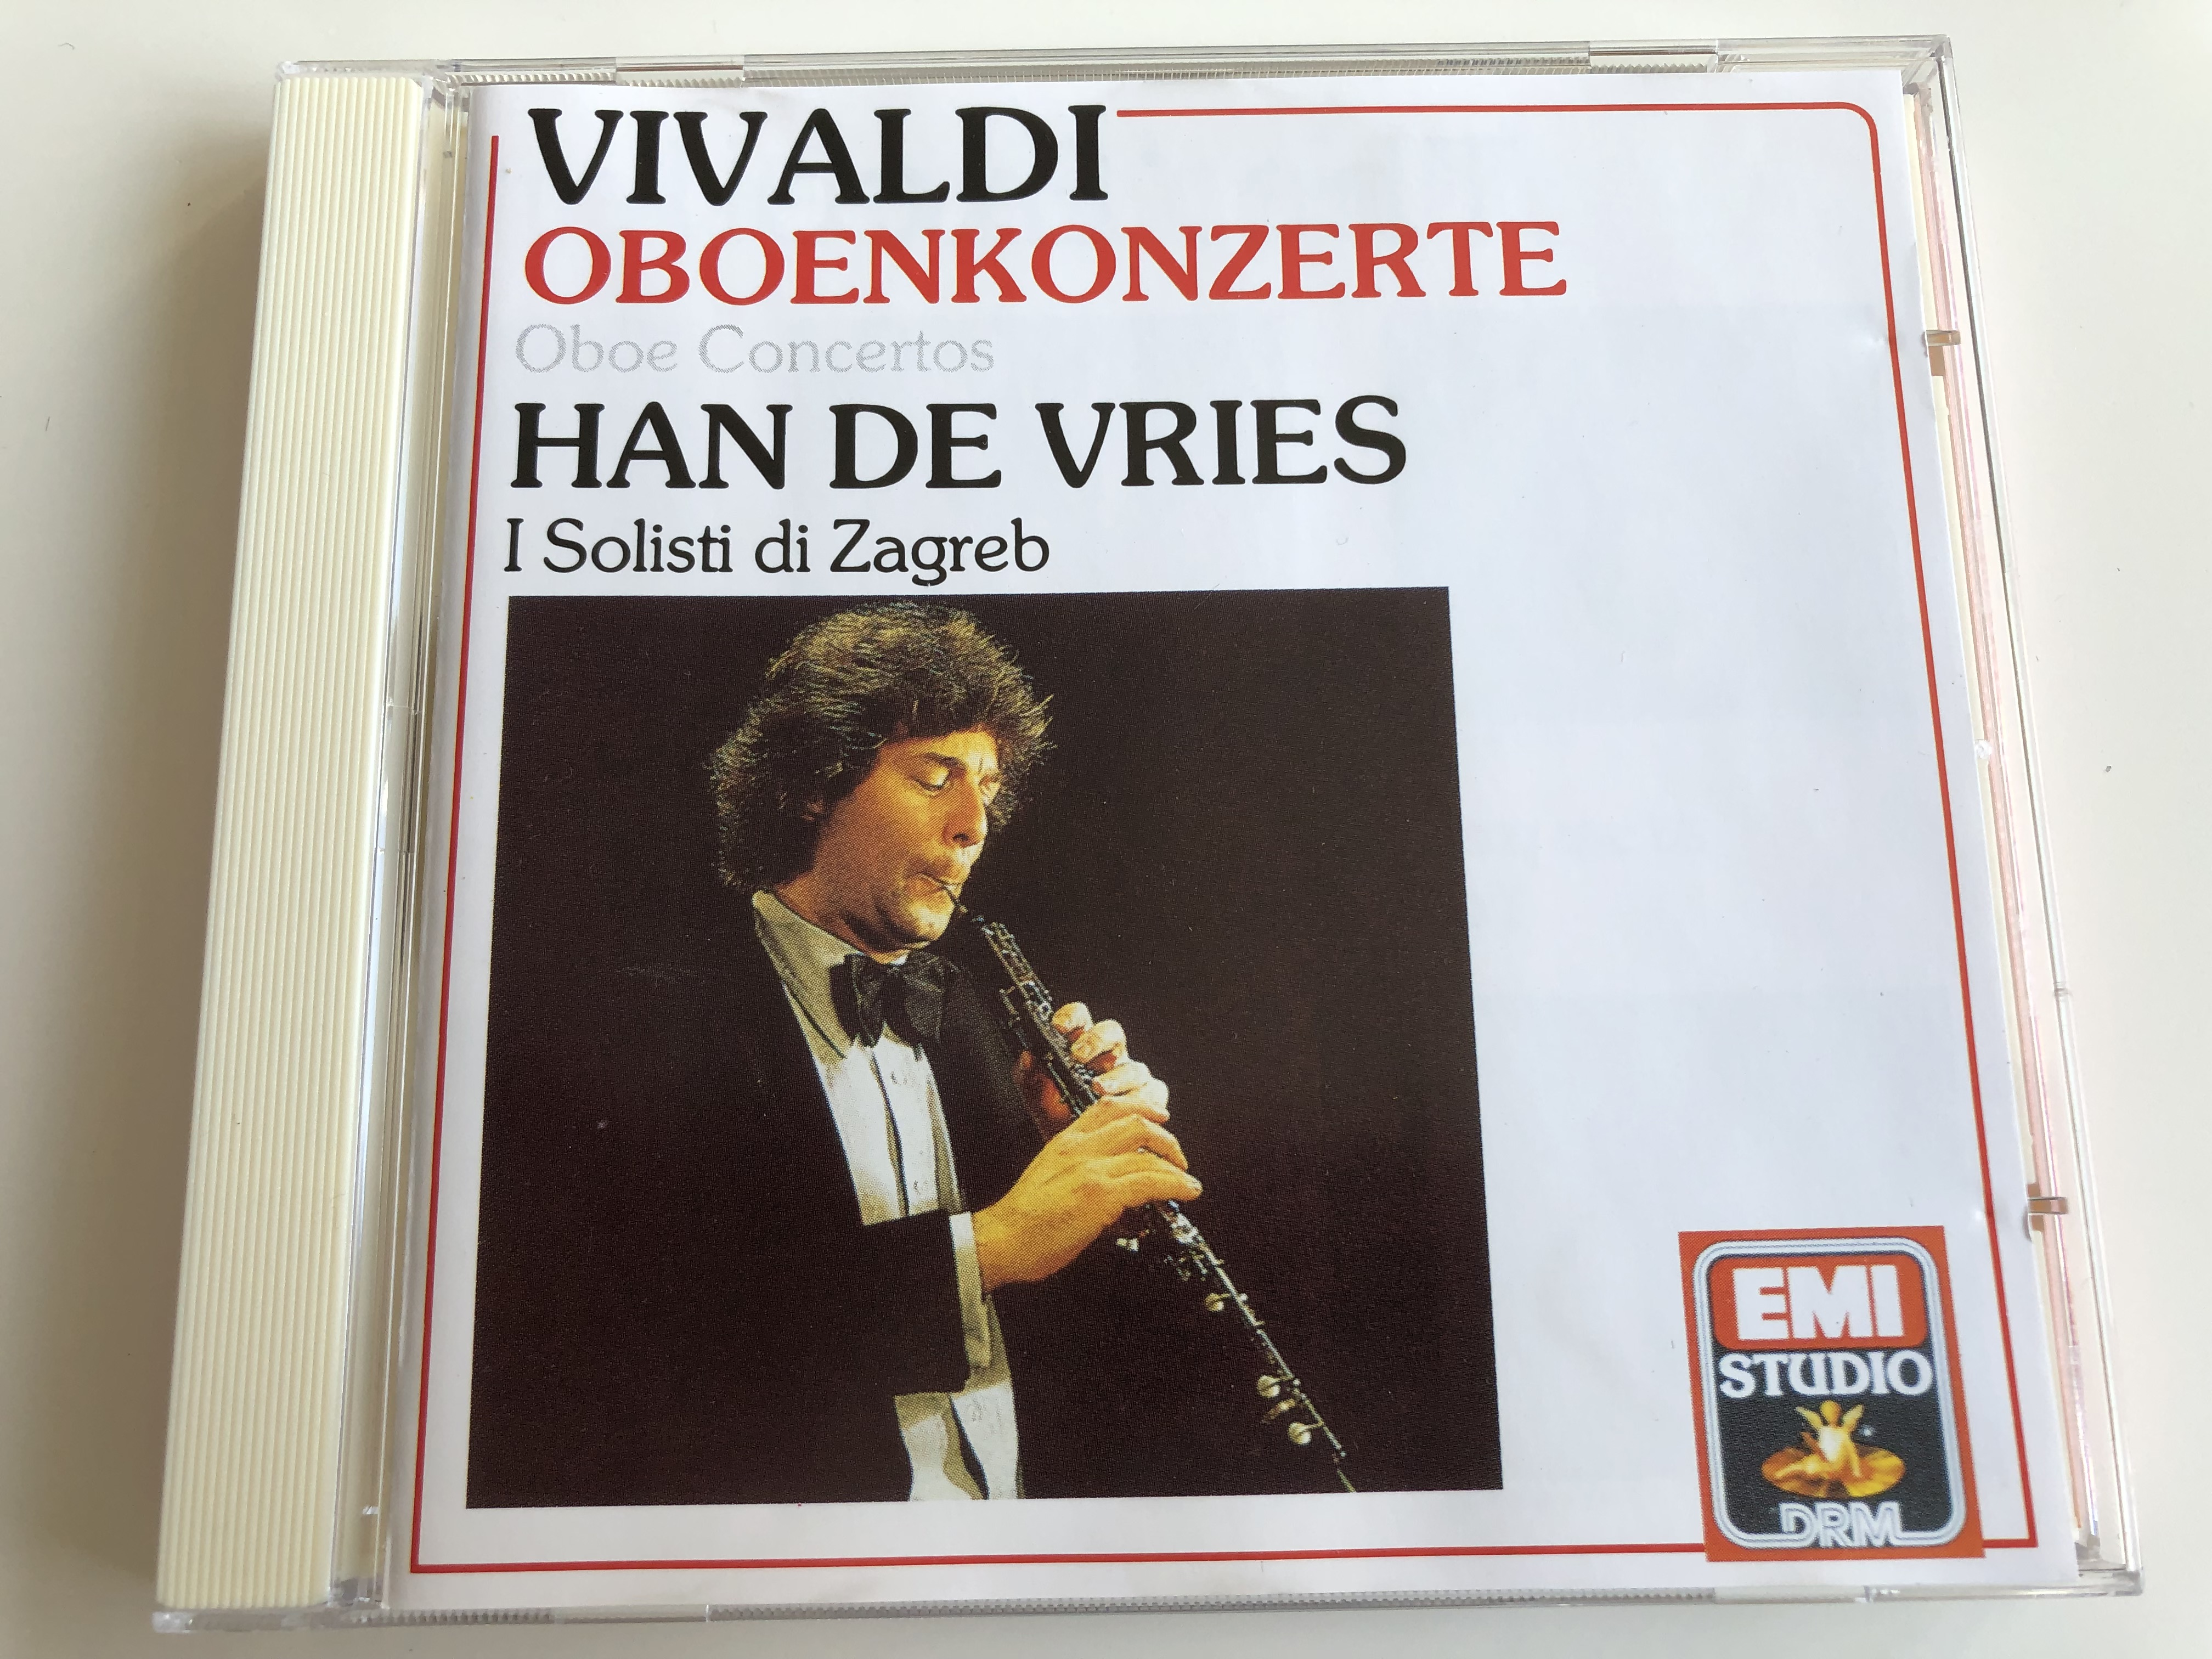 vivaldi-oboenkonzerte-oboe-concertos-han-de-vries-i-solisti-di-zagreb-emi-studio-audio-cd-1985-cdm-4-89487-2-1-.jpg